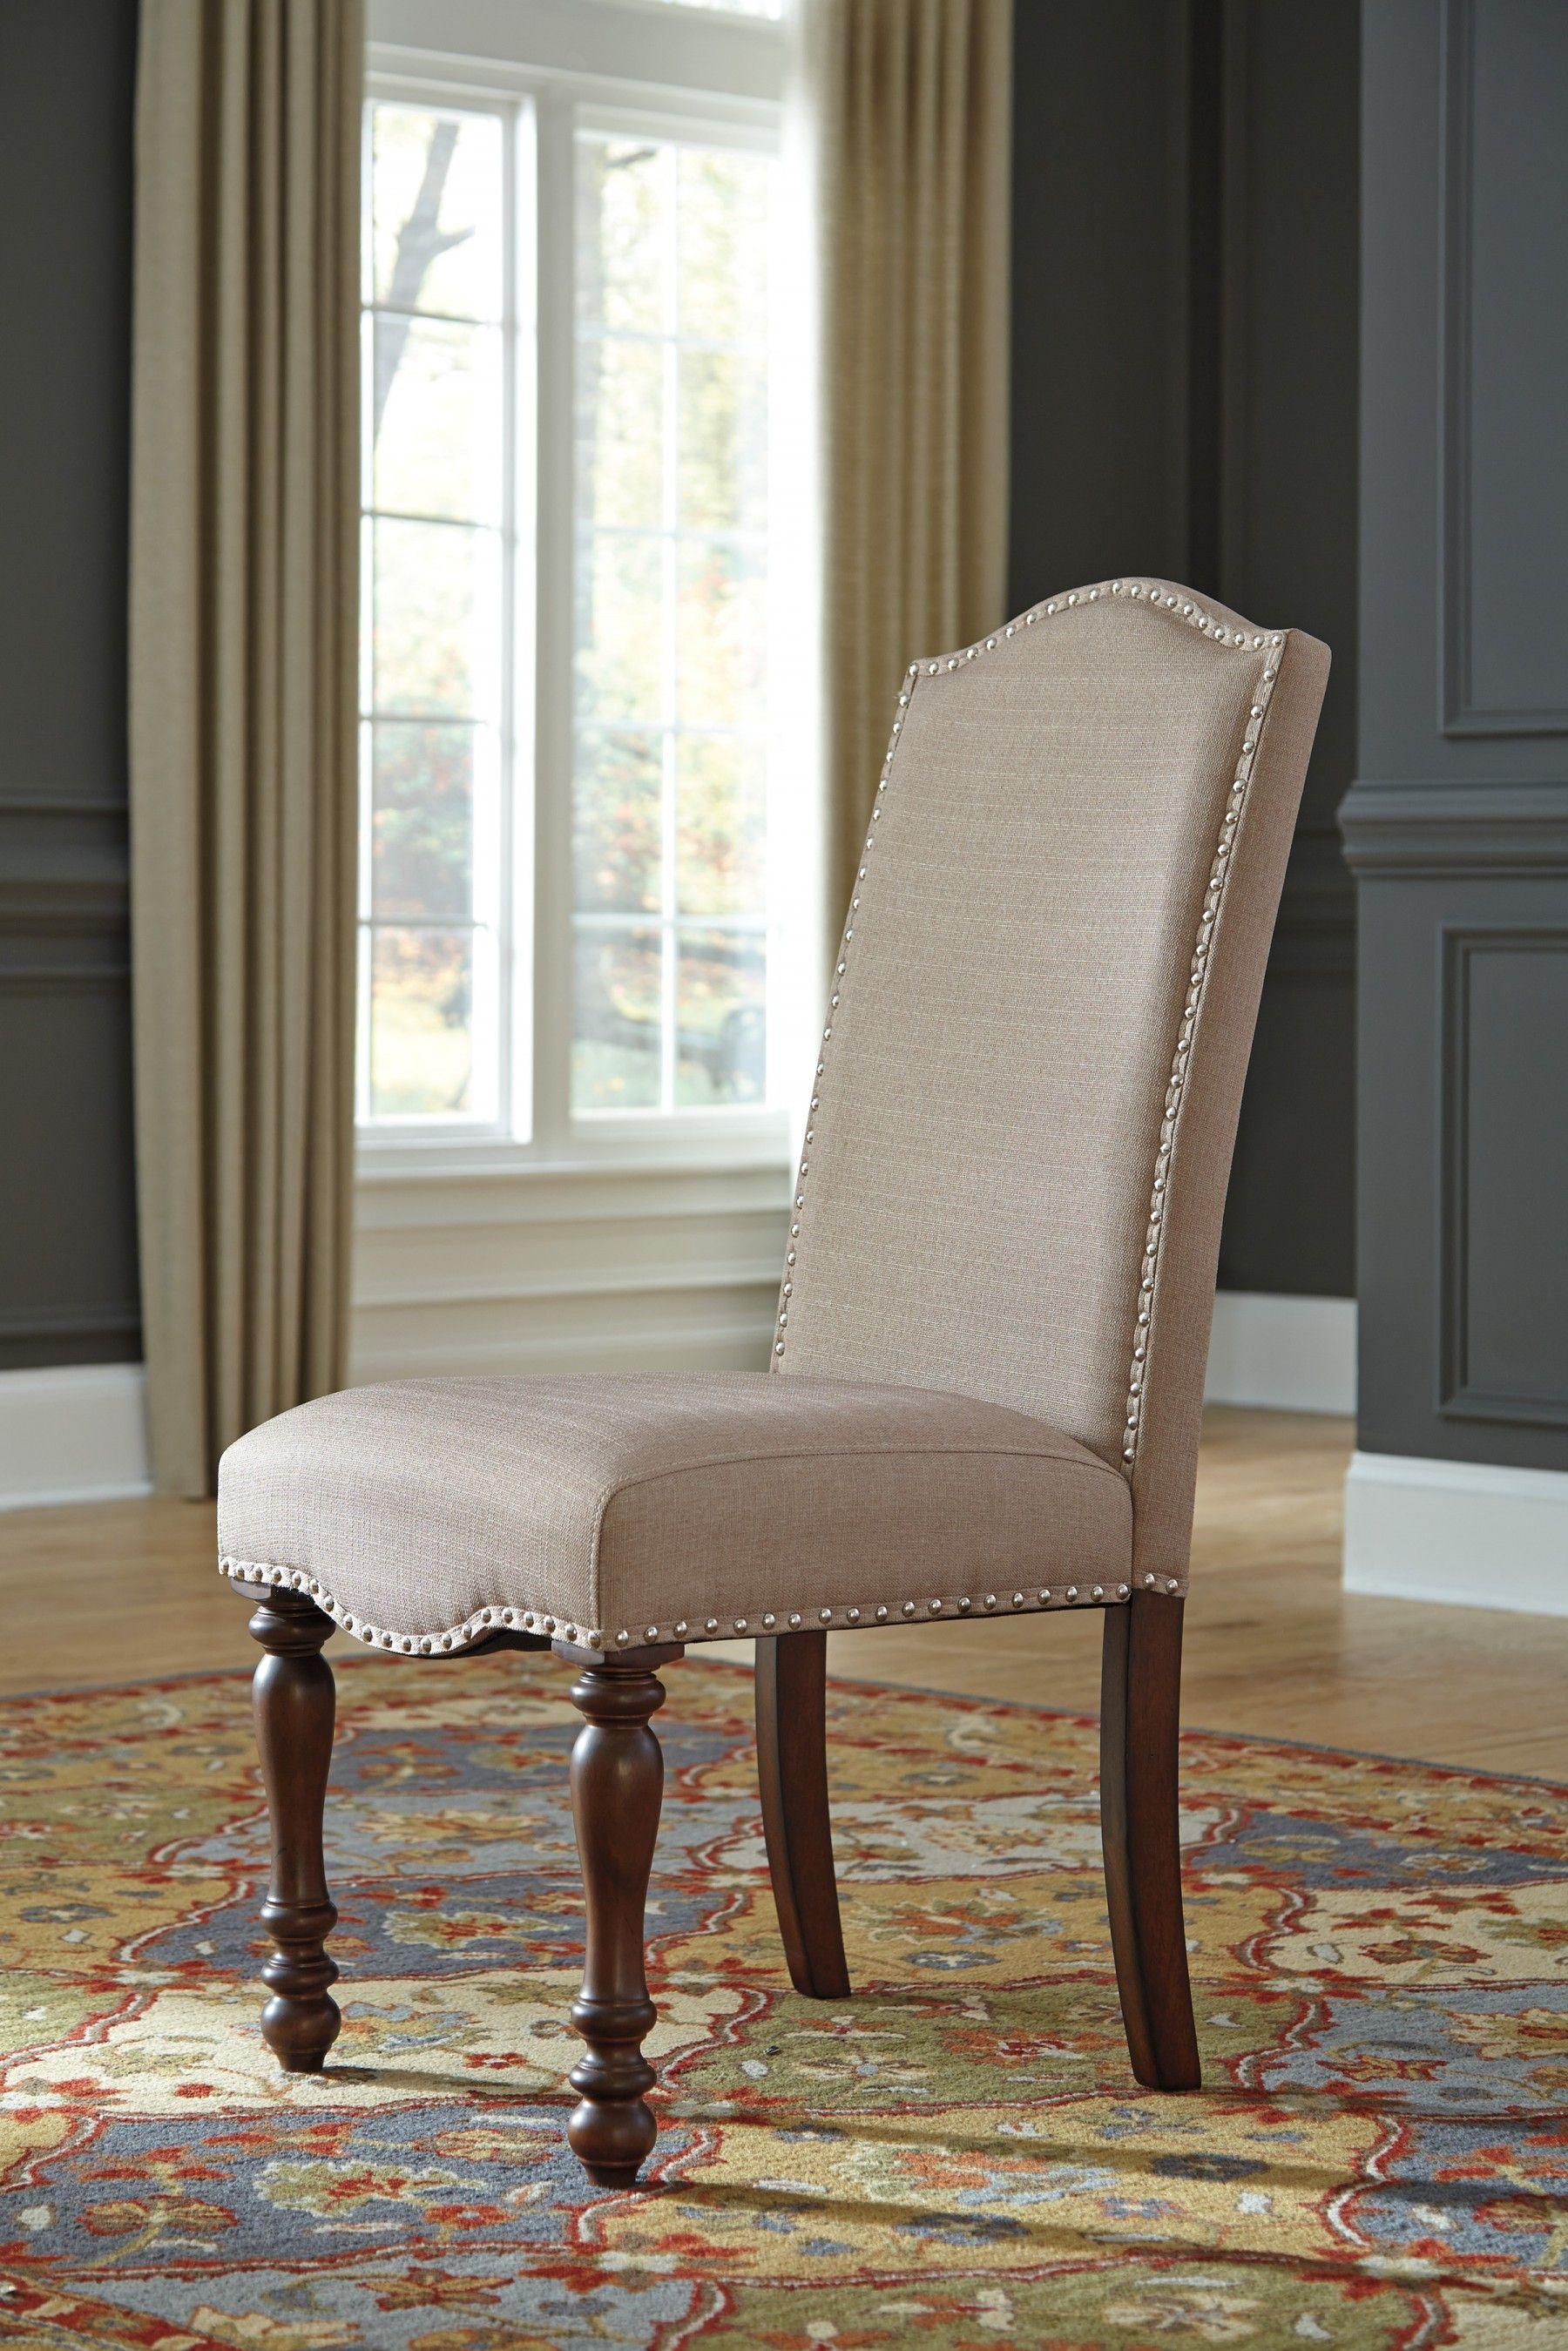 Baxenburg Brown Dining Upholstered Side Chair - Set of 2 | Pinterest